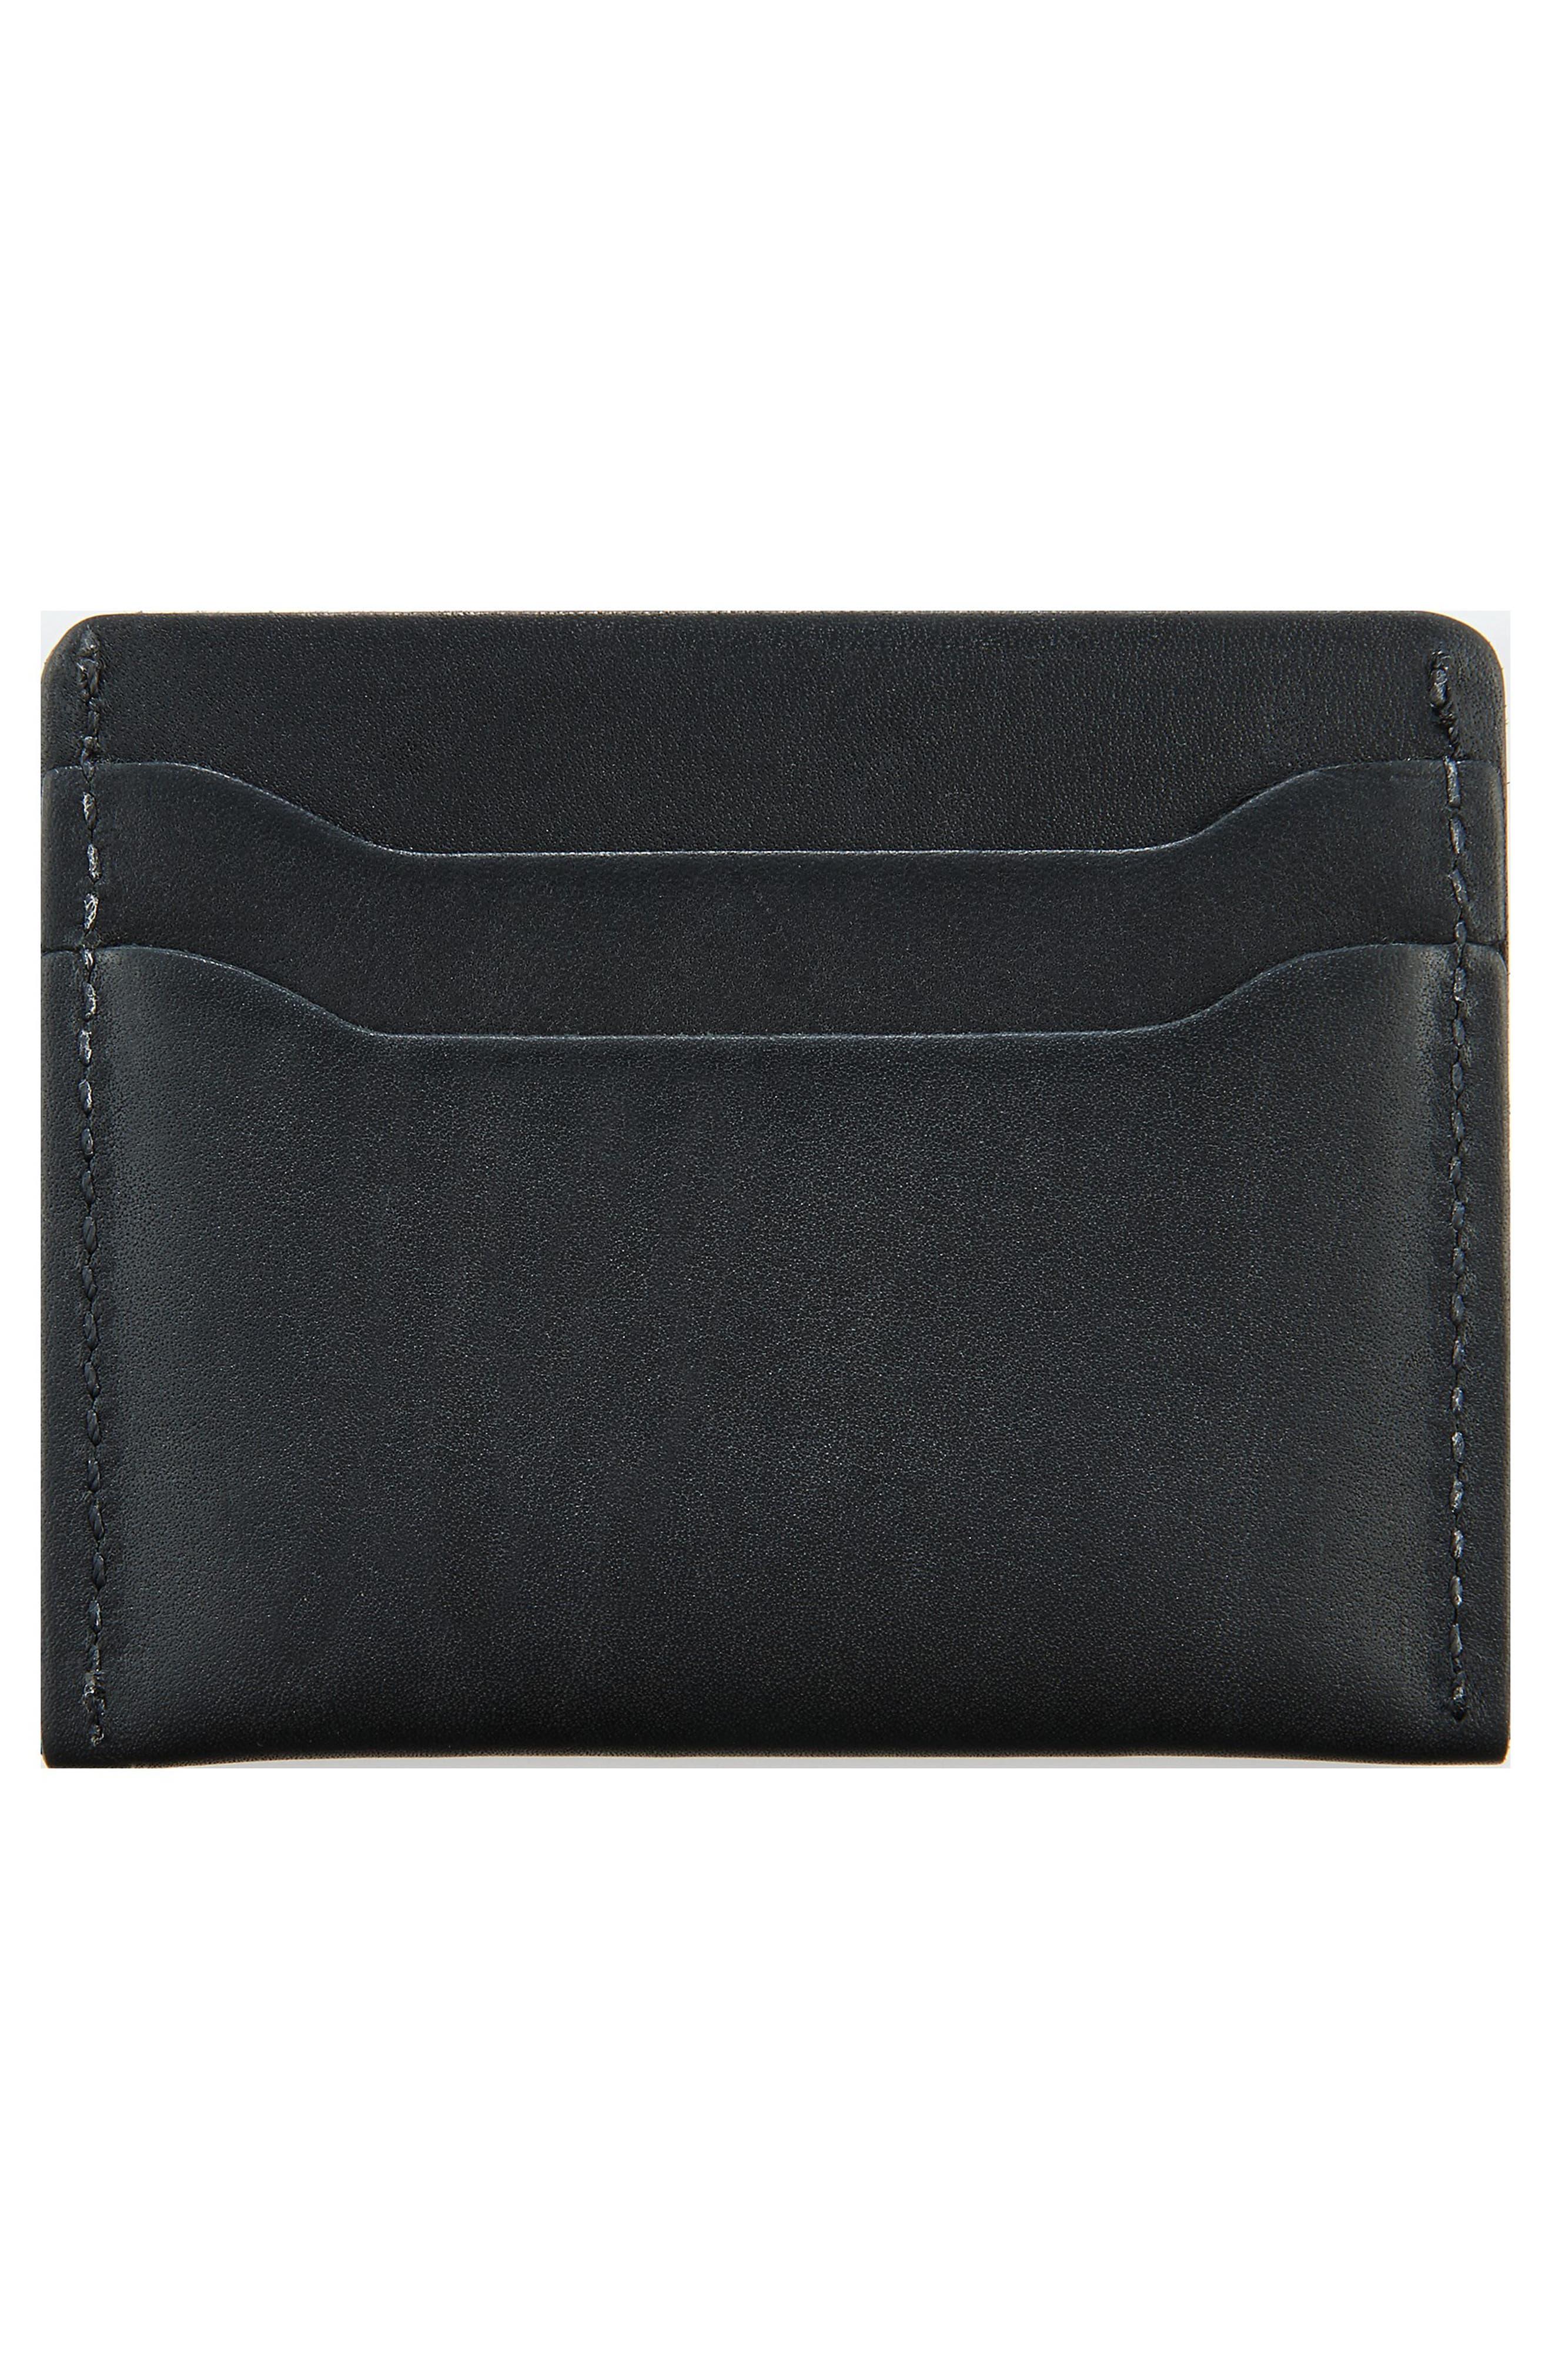 Leather Card Case,                             Alternate thumbnail 2, color,                             BLACK FRONTIER